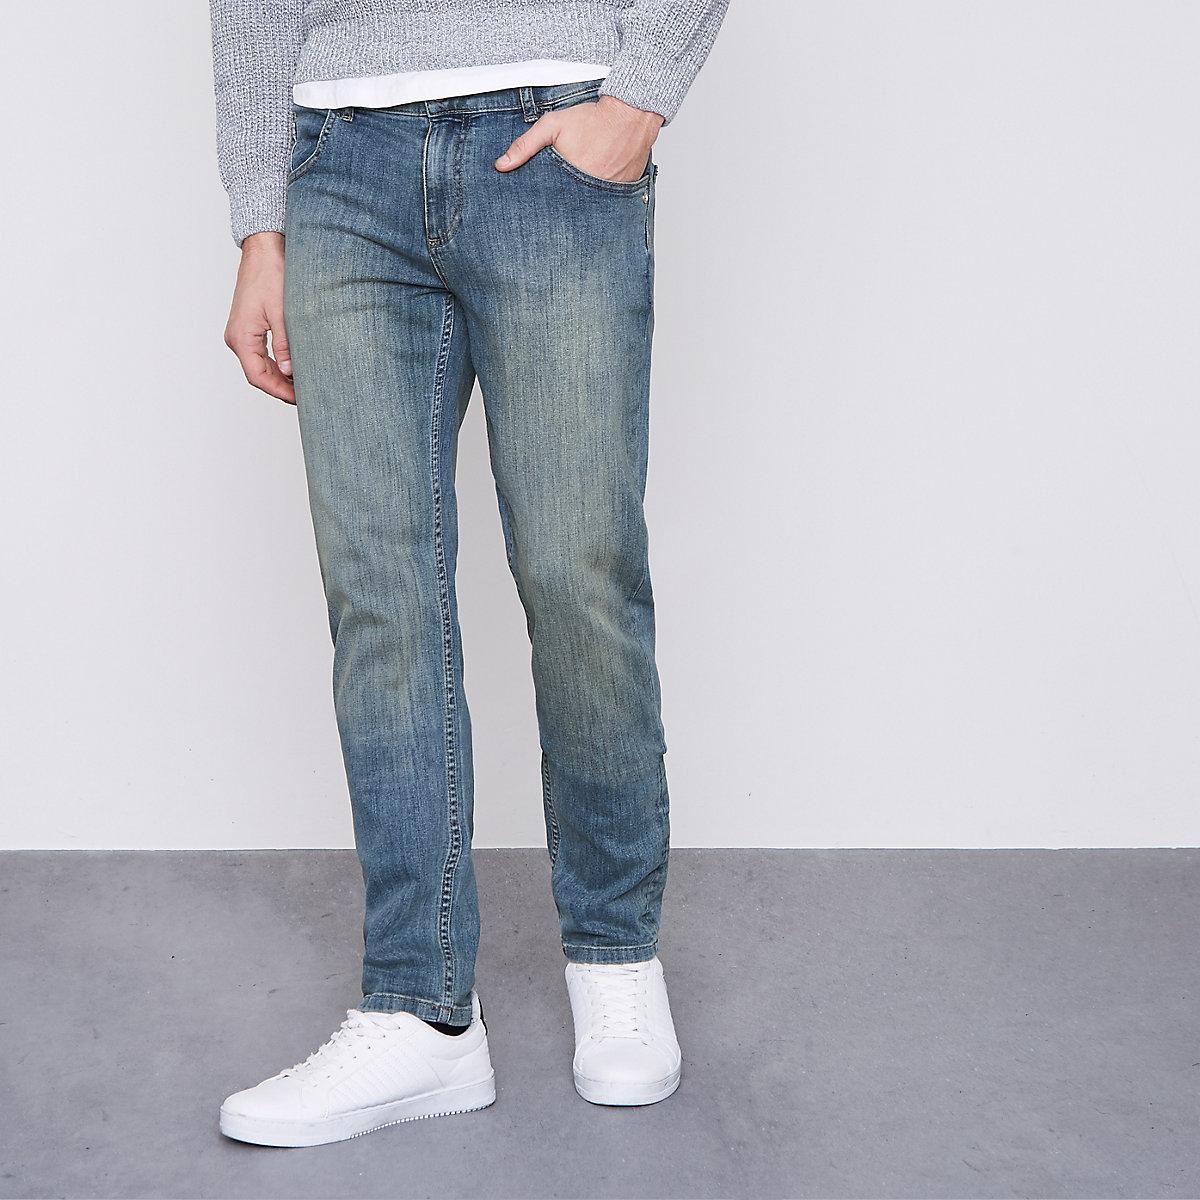 Monkee Genes blue slim tapered fit jeans